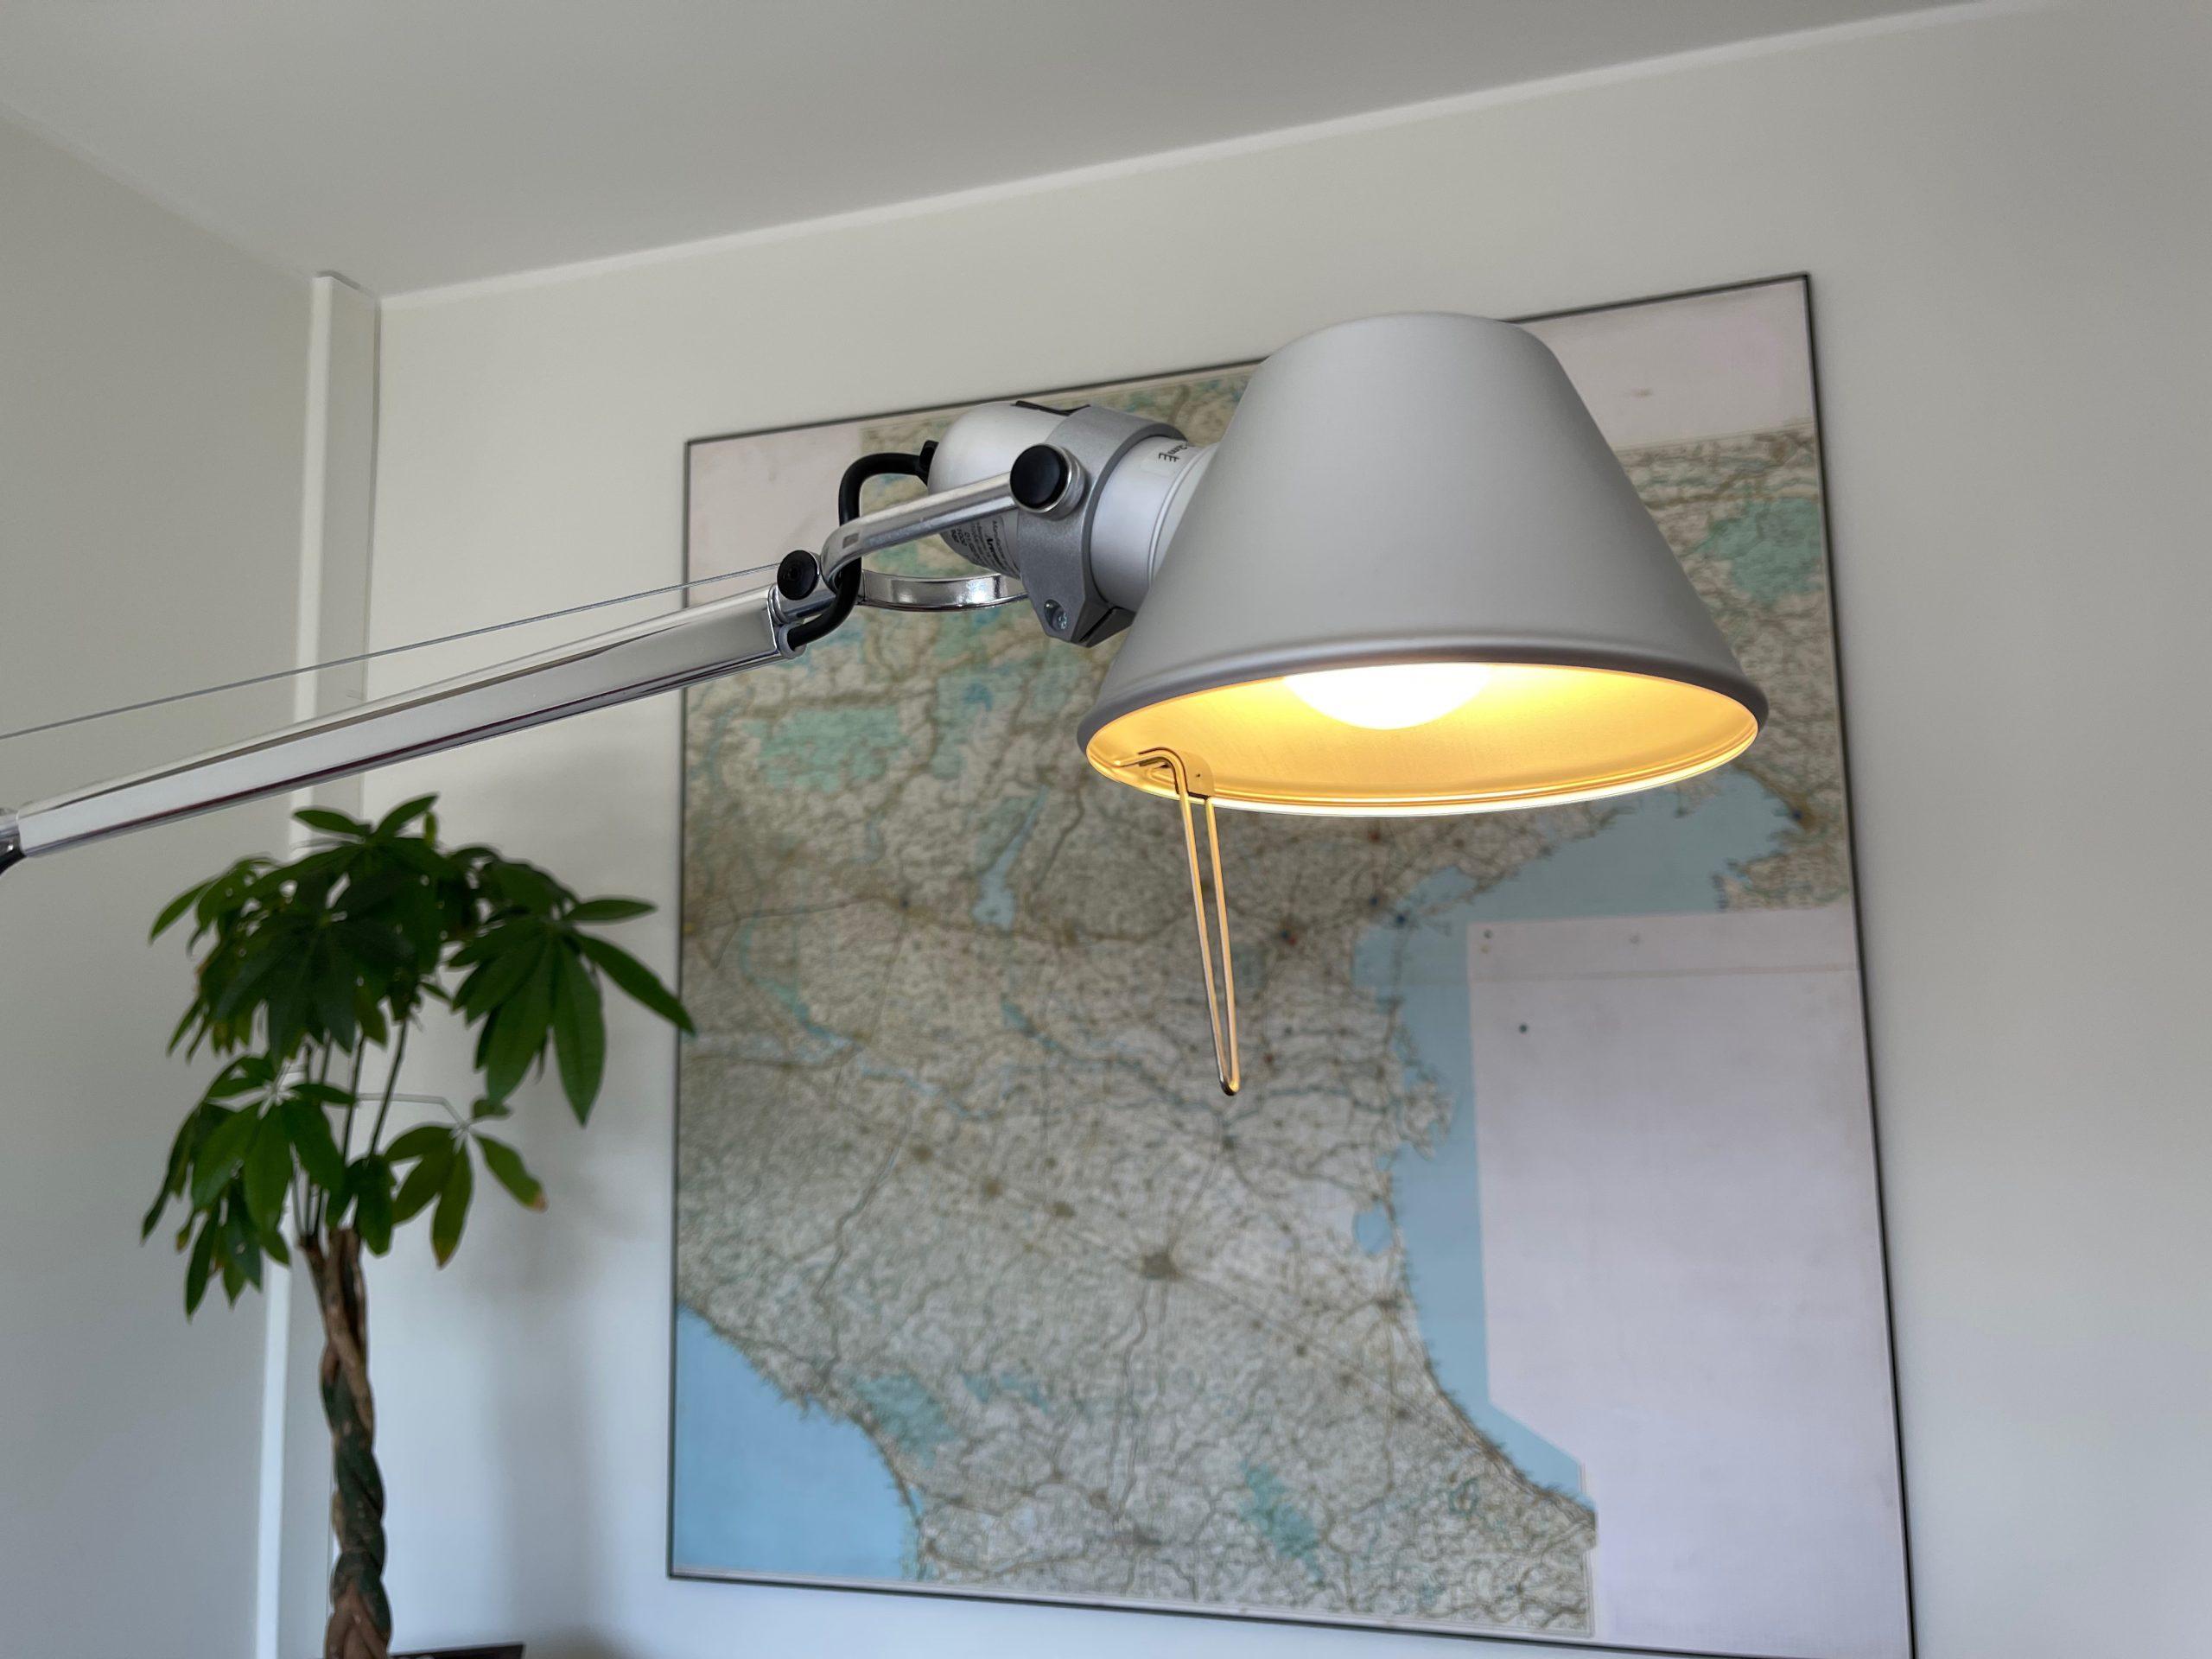 Energia & Infrastrutture – Avvocato Padova Studio Legale UGO.Legal